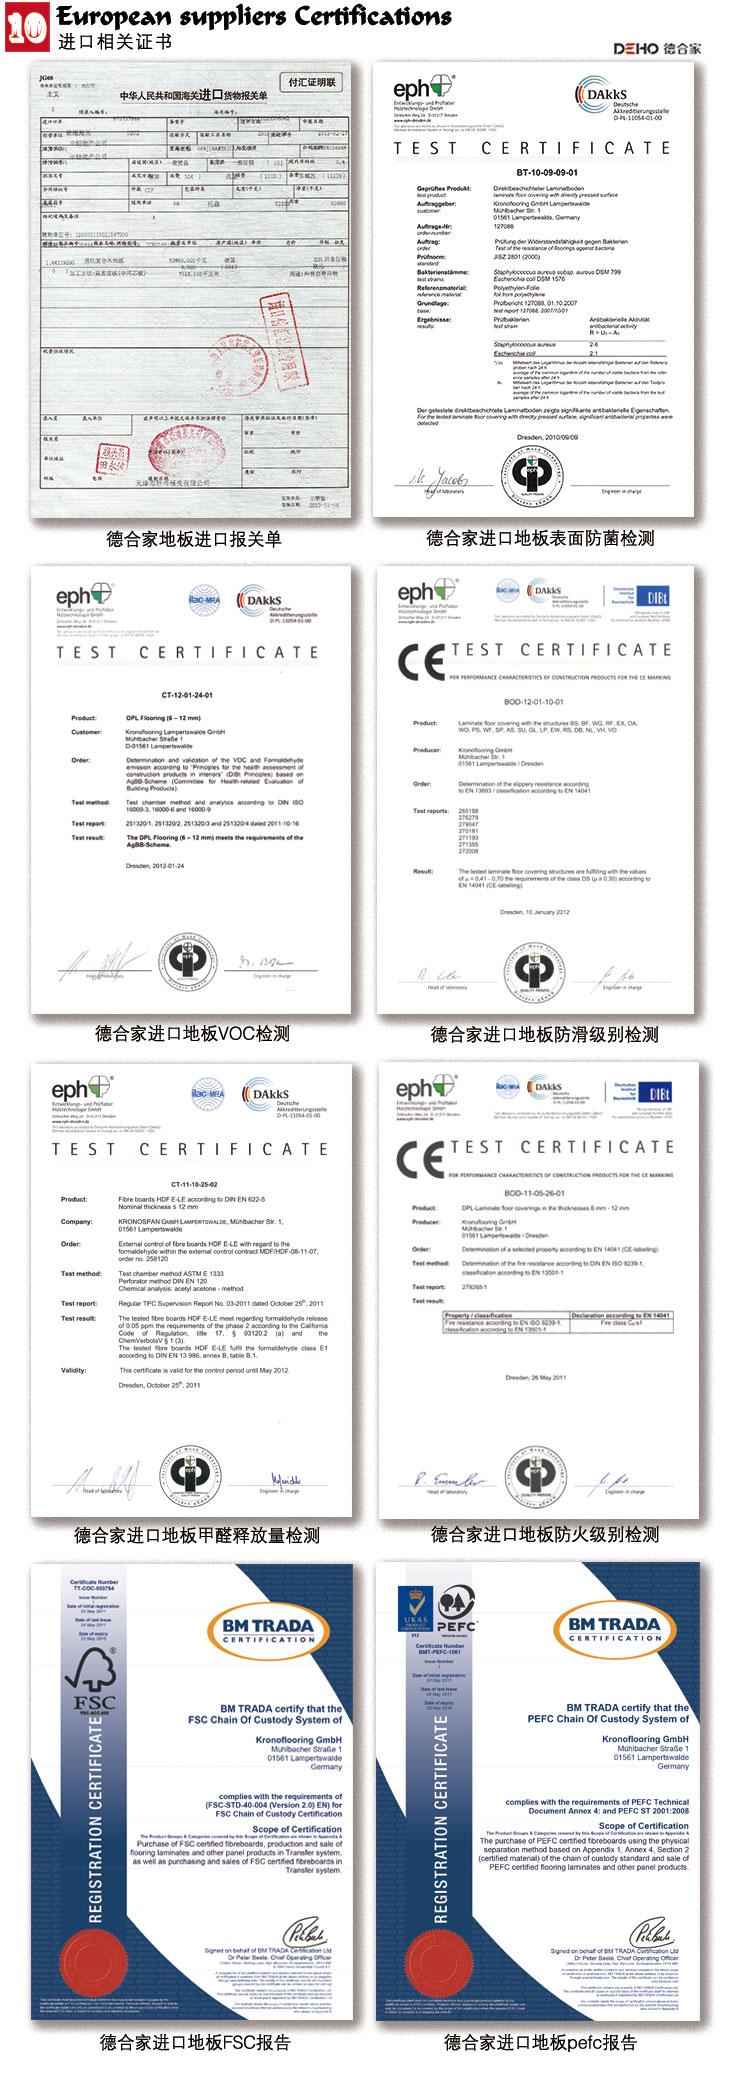 10-European-suppliers-Certifications.jpg